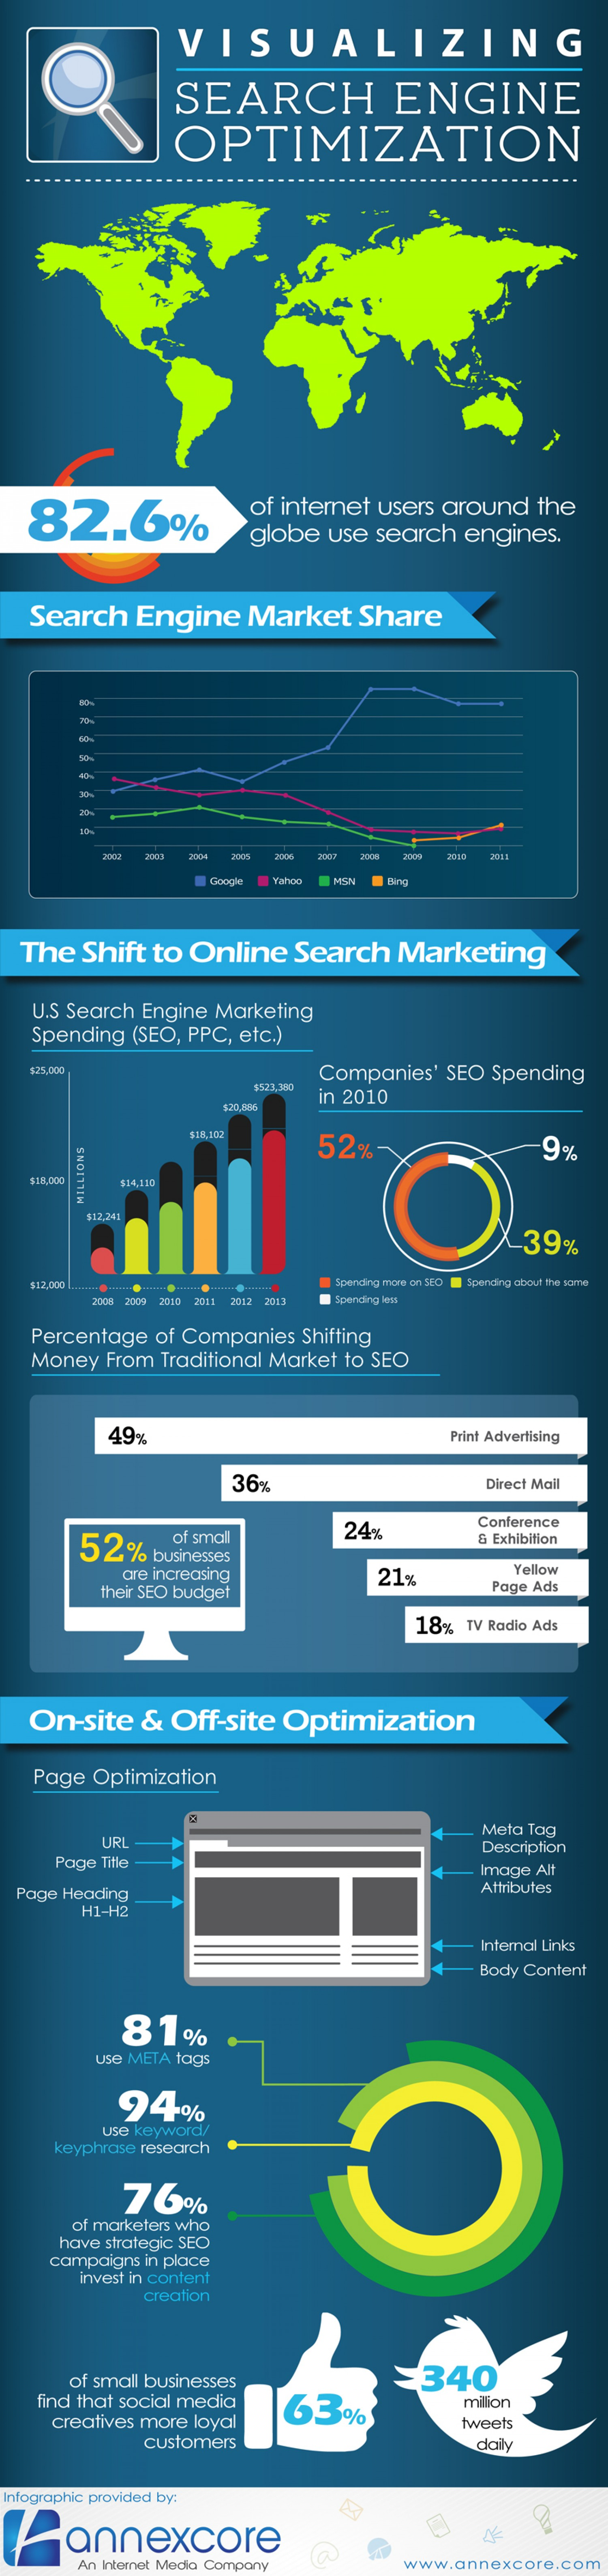 Visualizing Search Engine Optimization